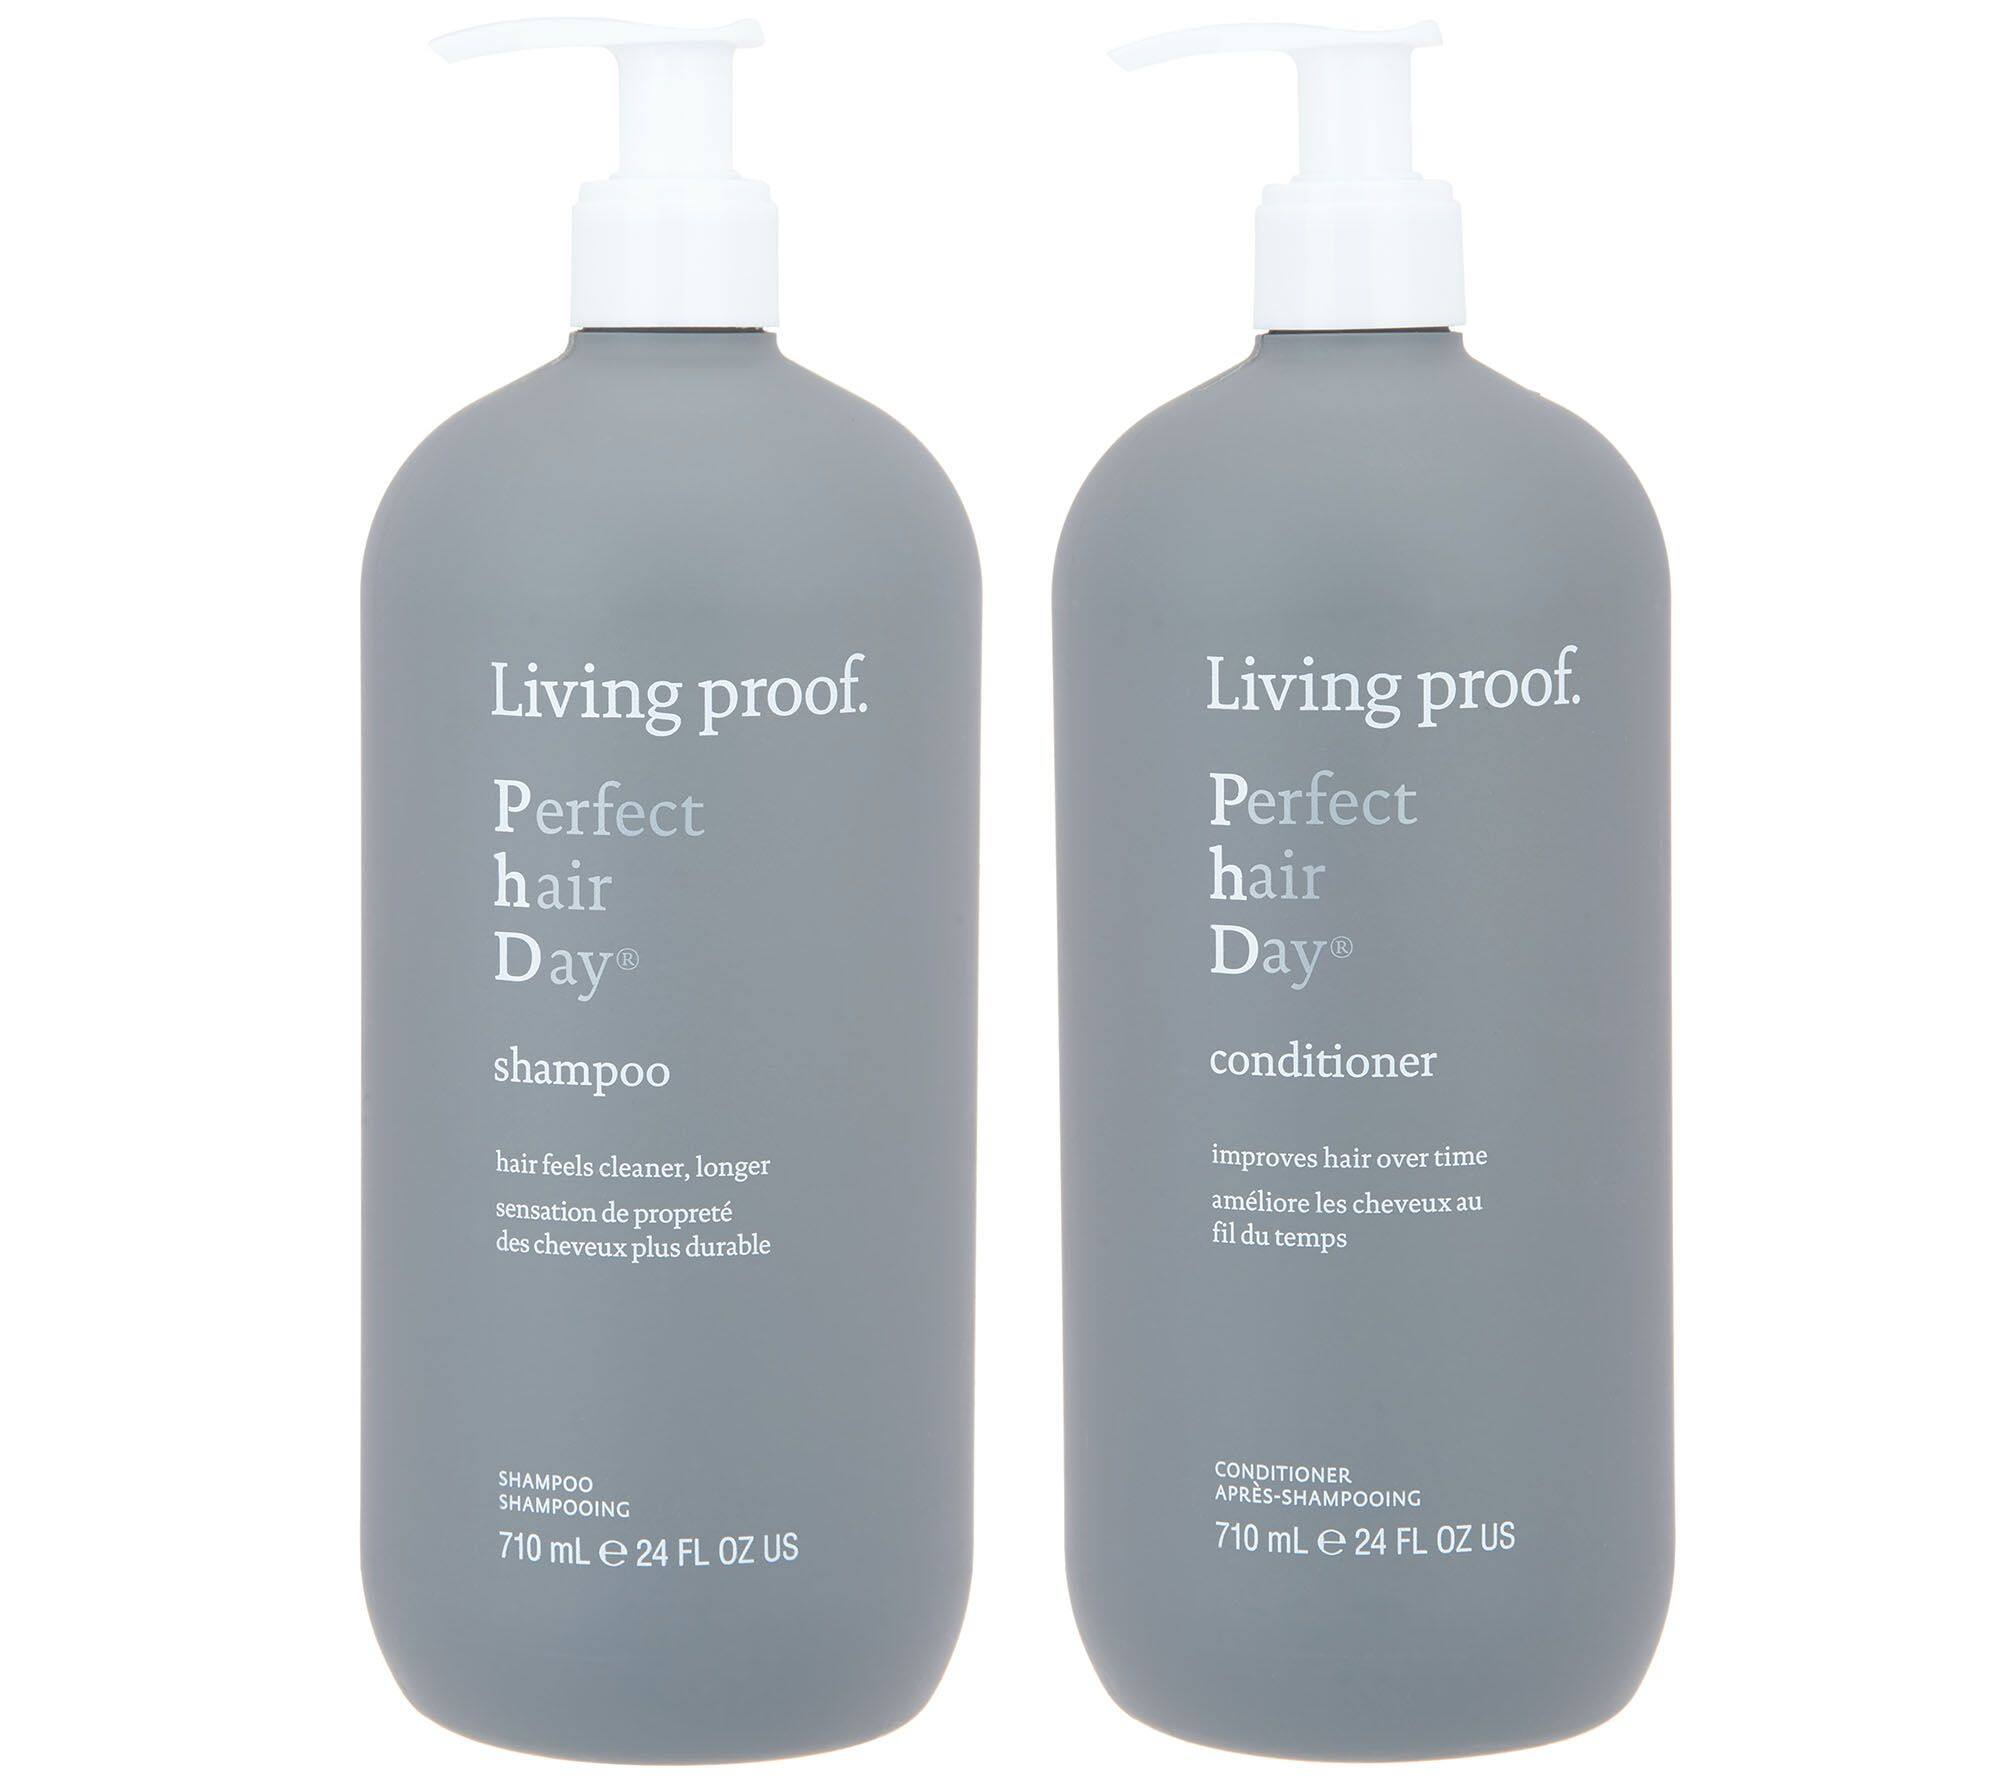 Living Proof Shampoo & Conditioner Set - $69 + $3.50 shipping @ QVC